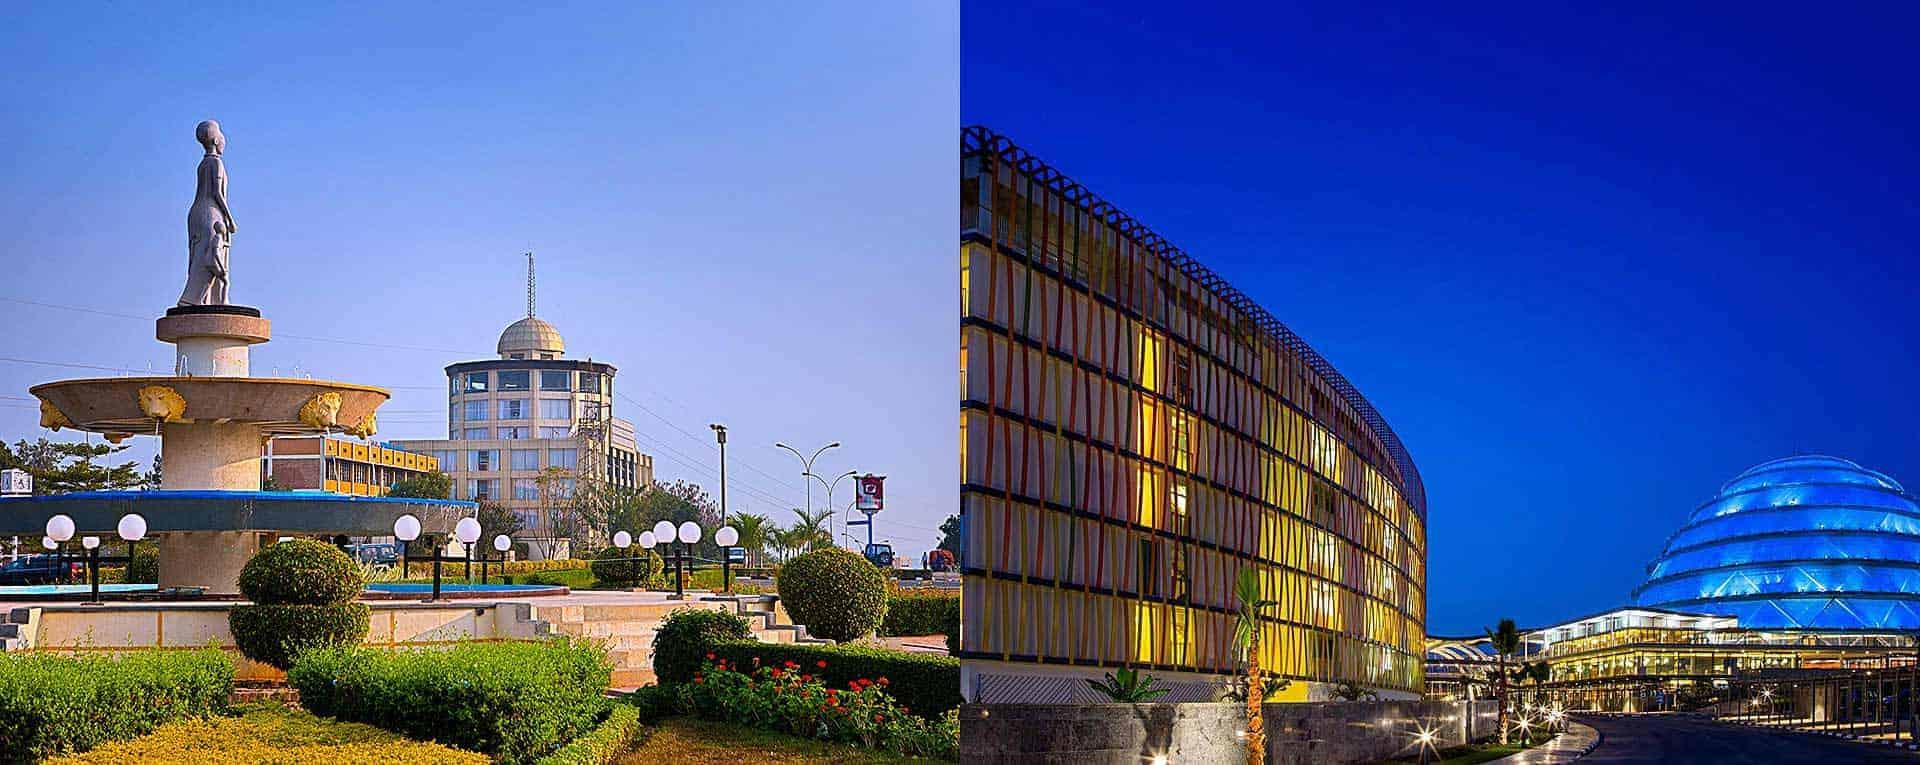 Expert Rating Reviews >> Expert Guide On Kigali City In Rwanda - AfricanMecca Safaris